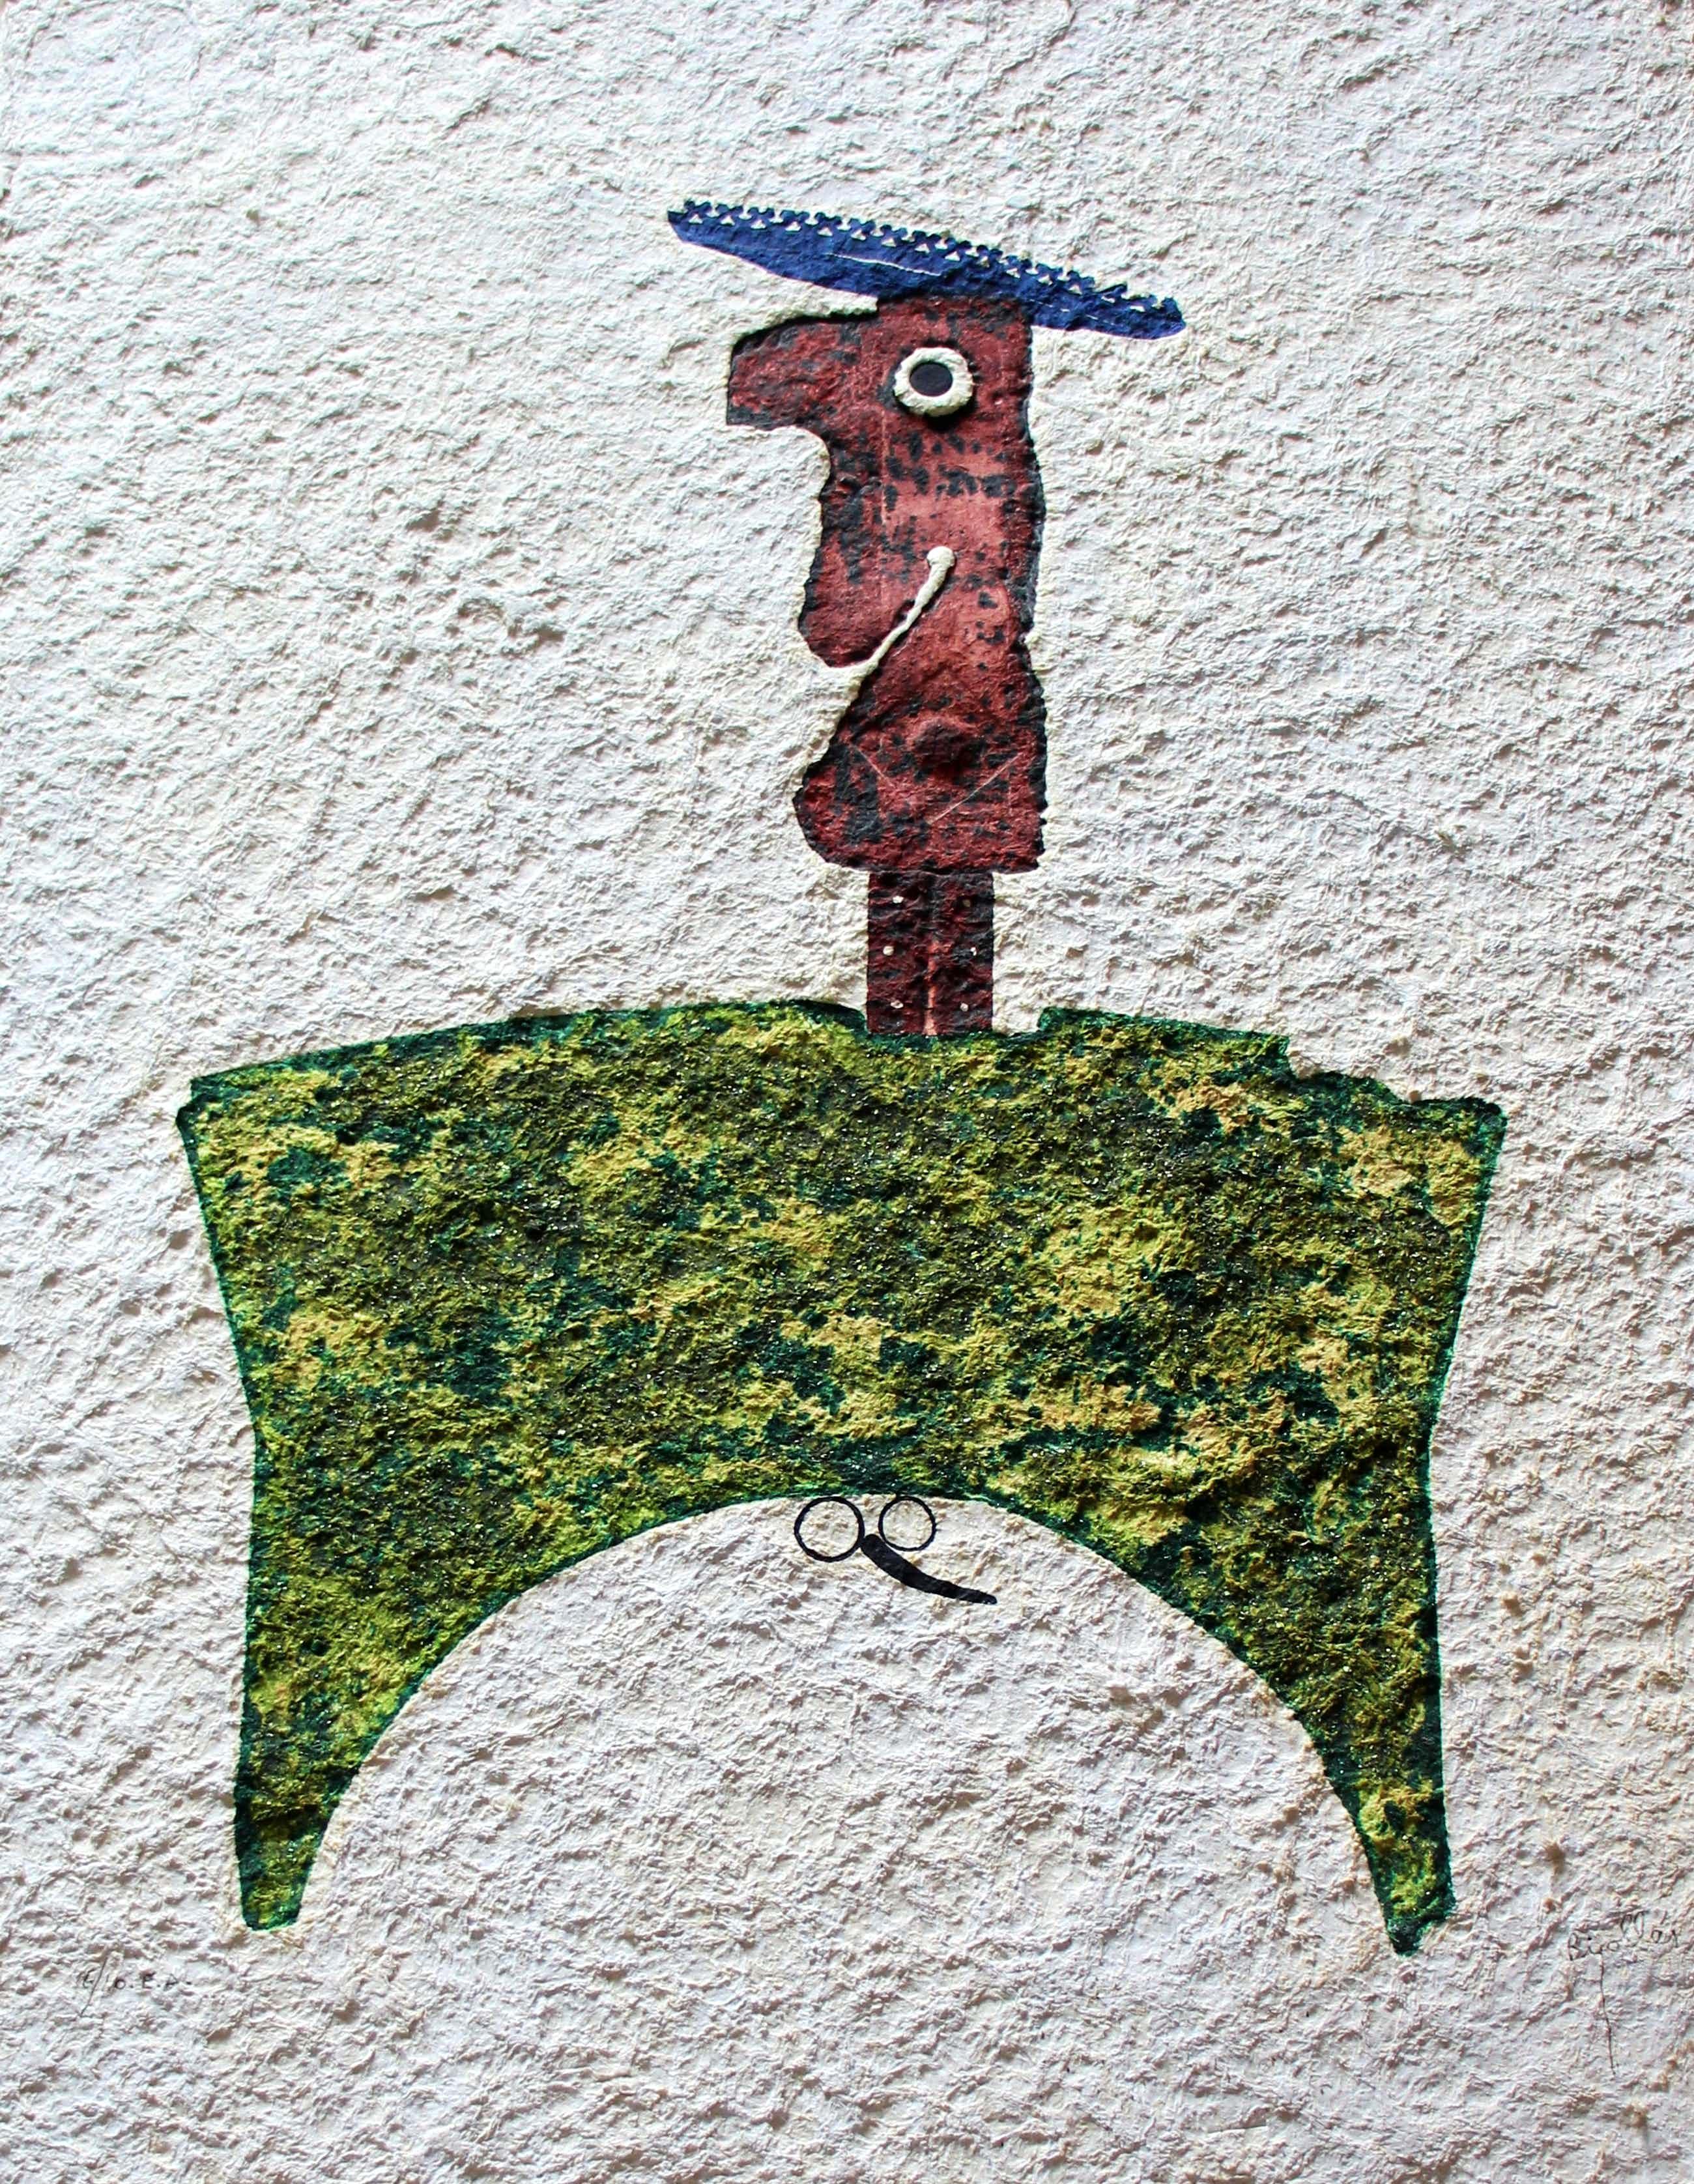 Juan Garcia Ripolles - reliefdruk: Le Coq couronné - kopen? Bied vanaf 270!